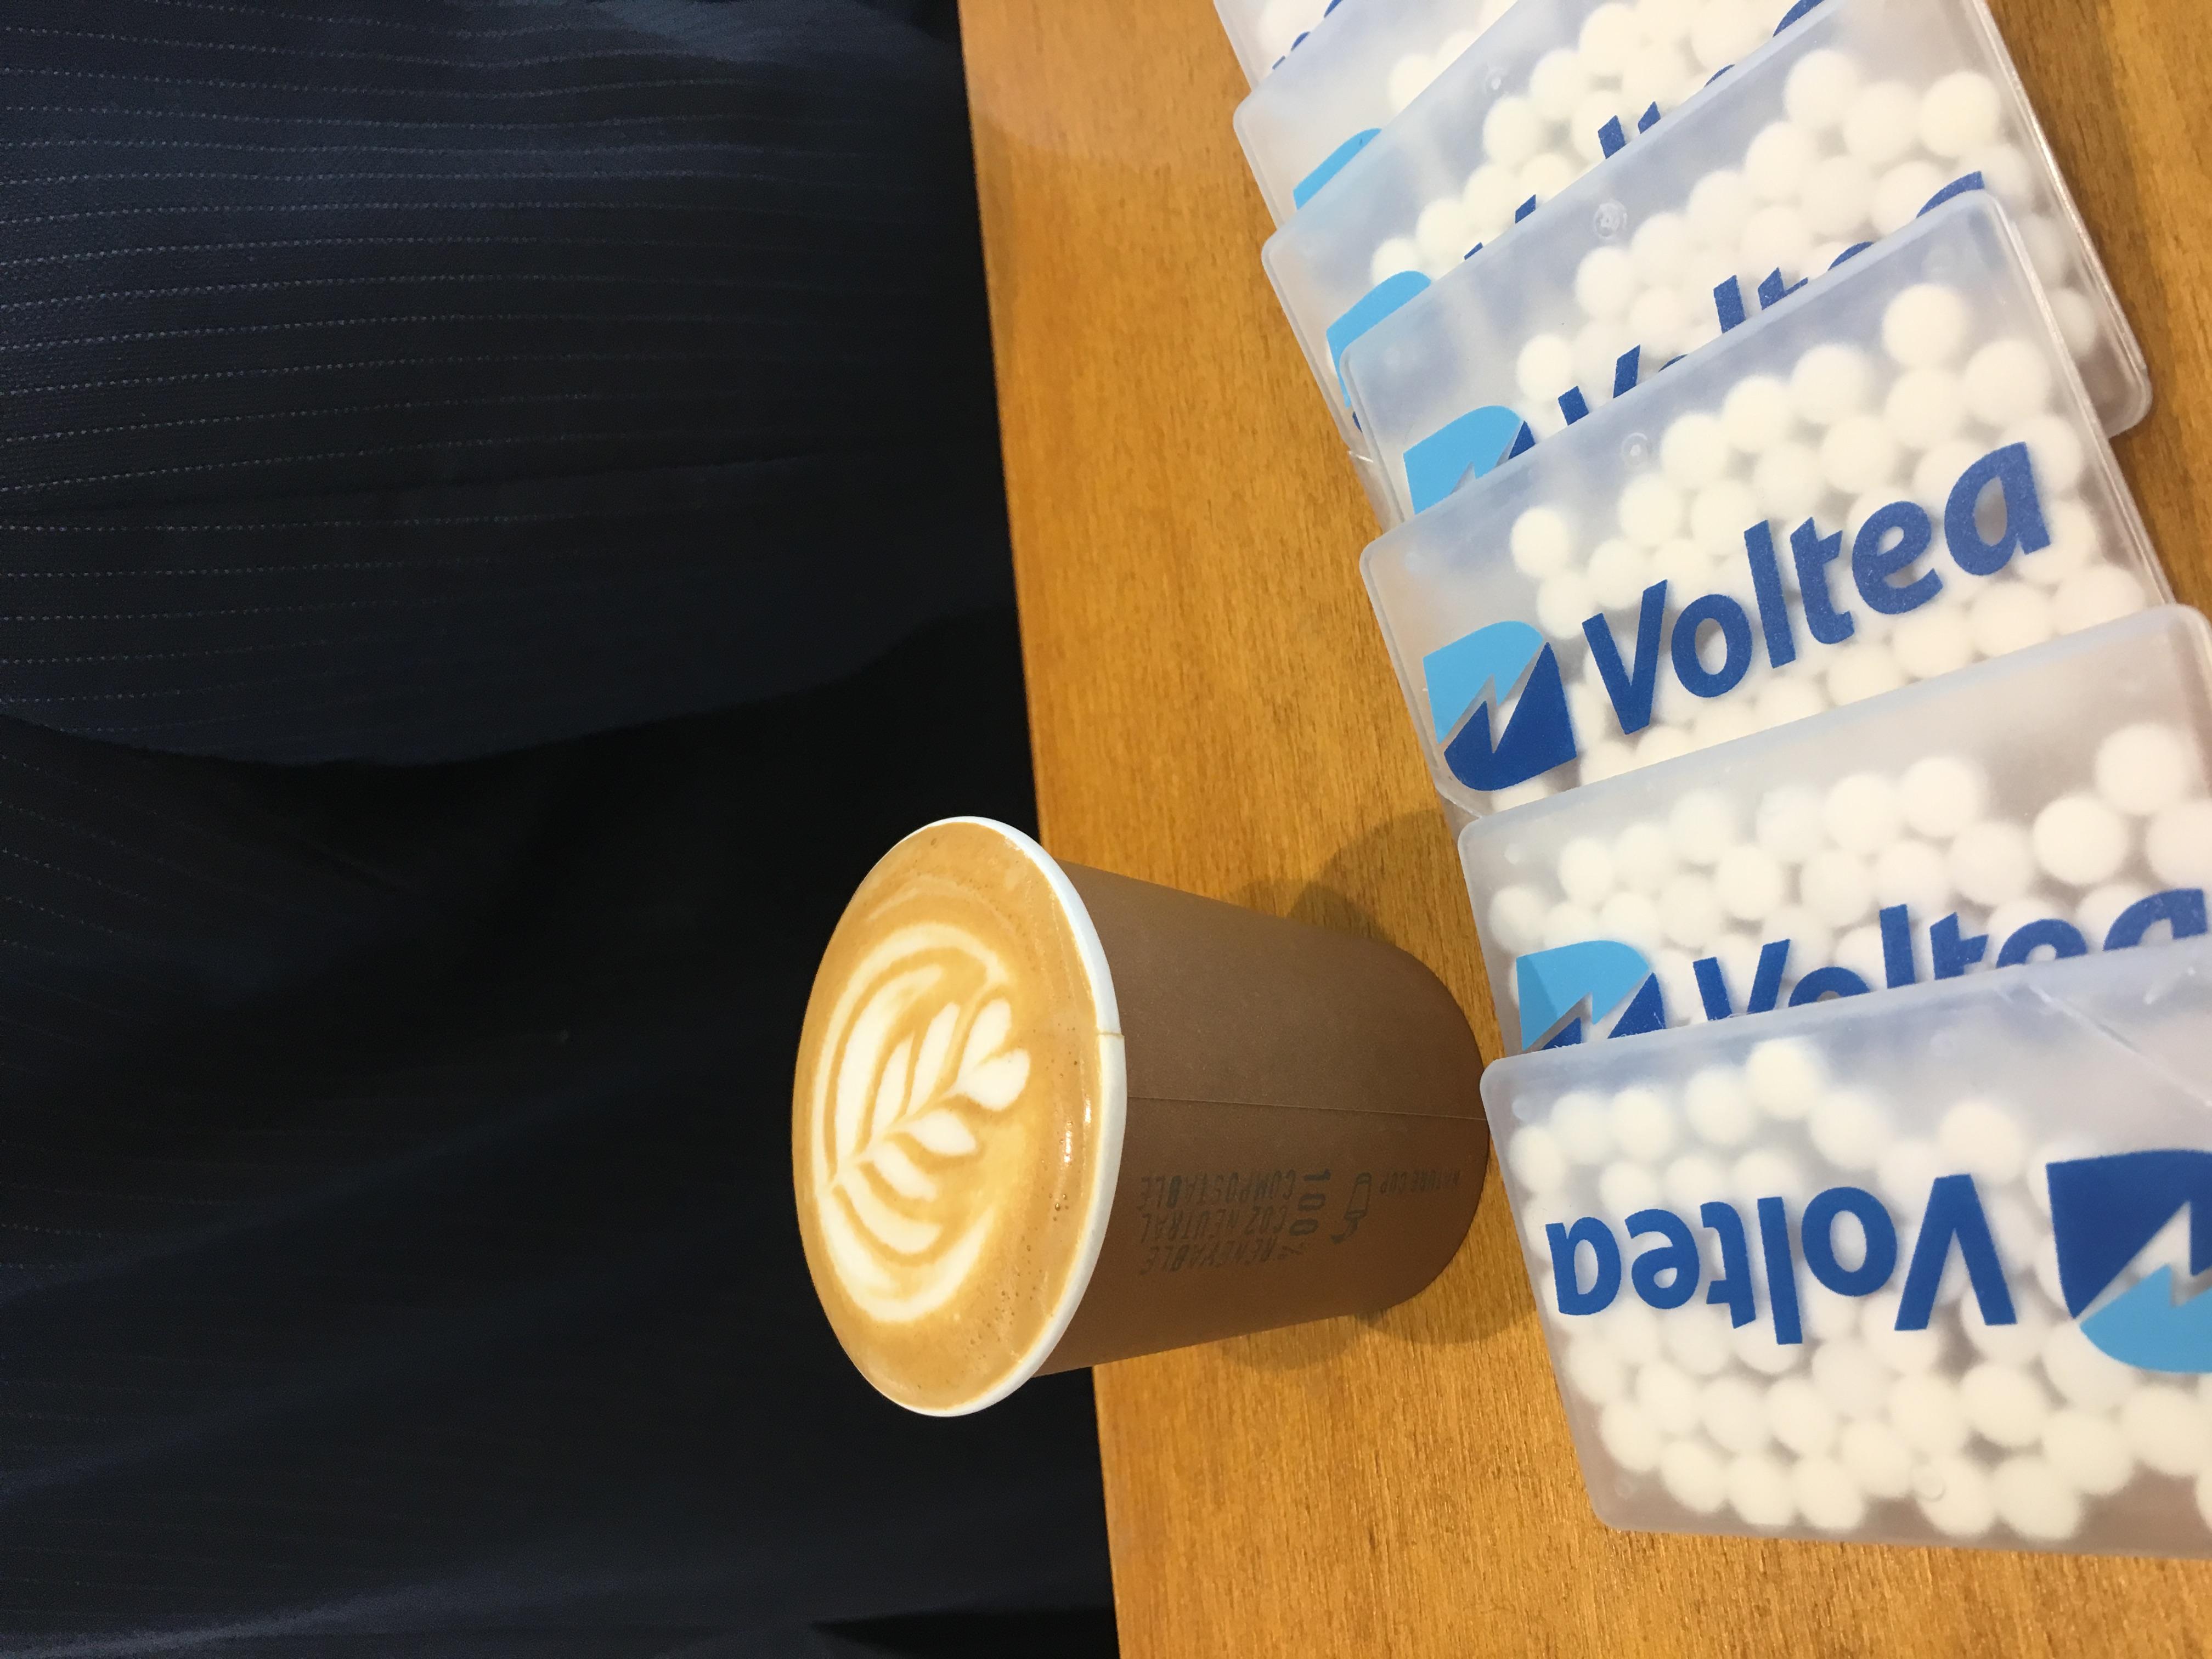 Voltea Aquatech Amsterdam RAI3